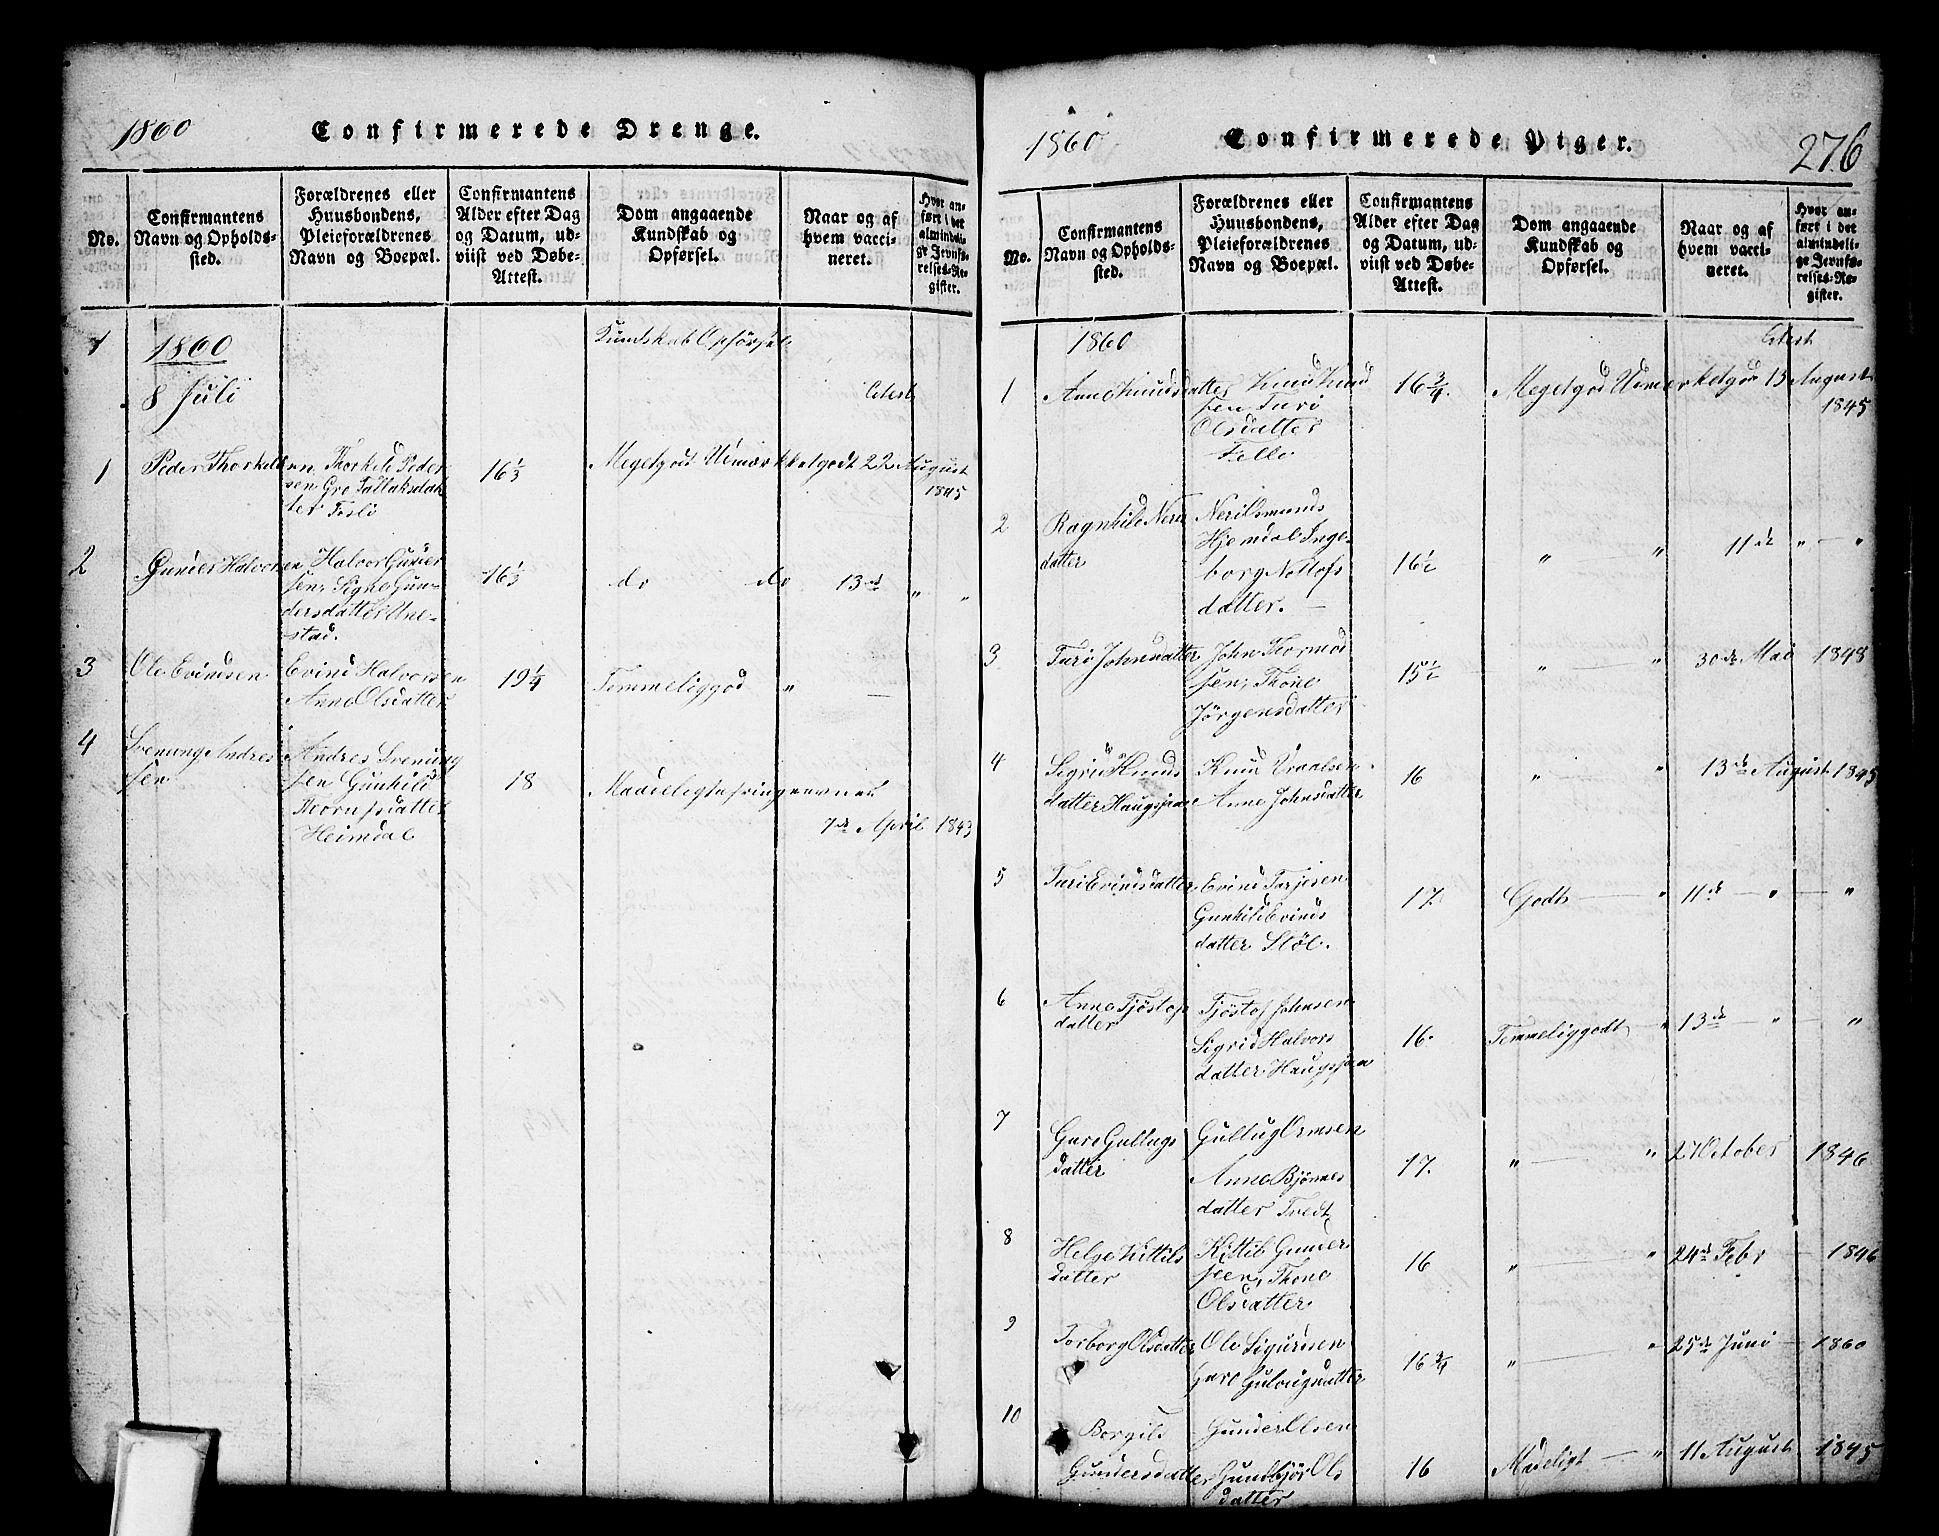 SAKO, Nissedal kirkebøker, G/Gb/L0001: Klokkerbok nr. II 1, 1814-1862, s. 276